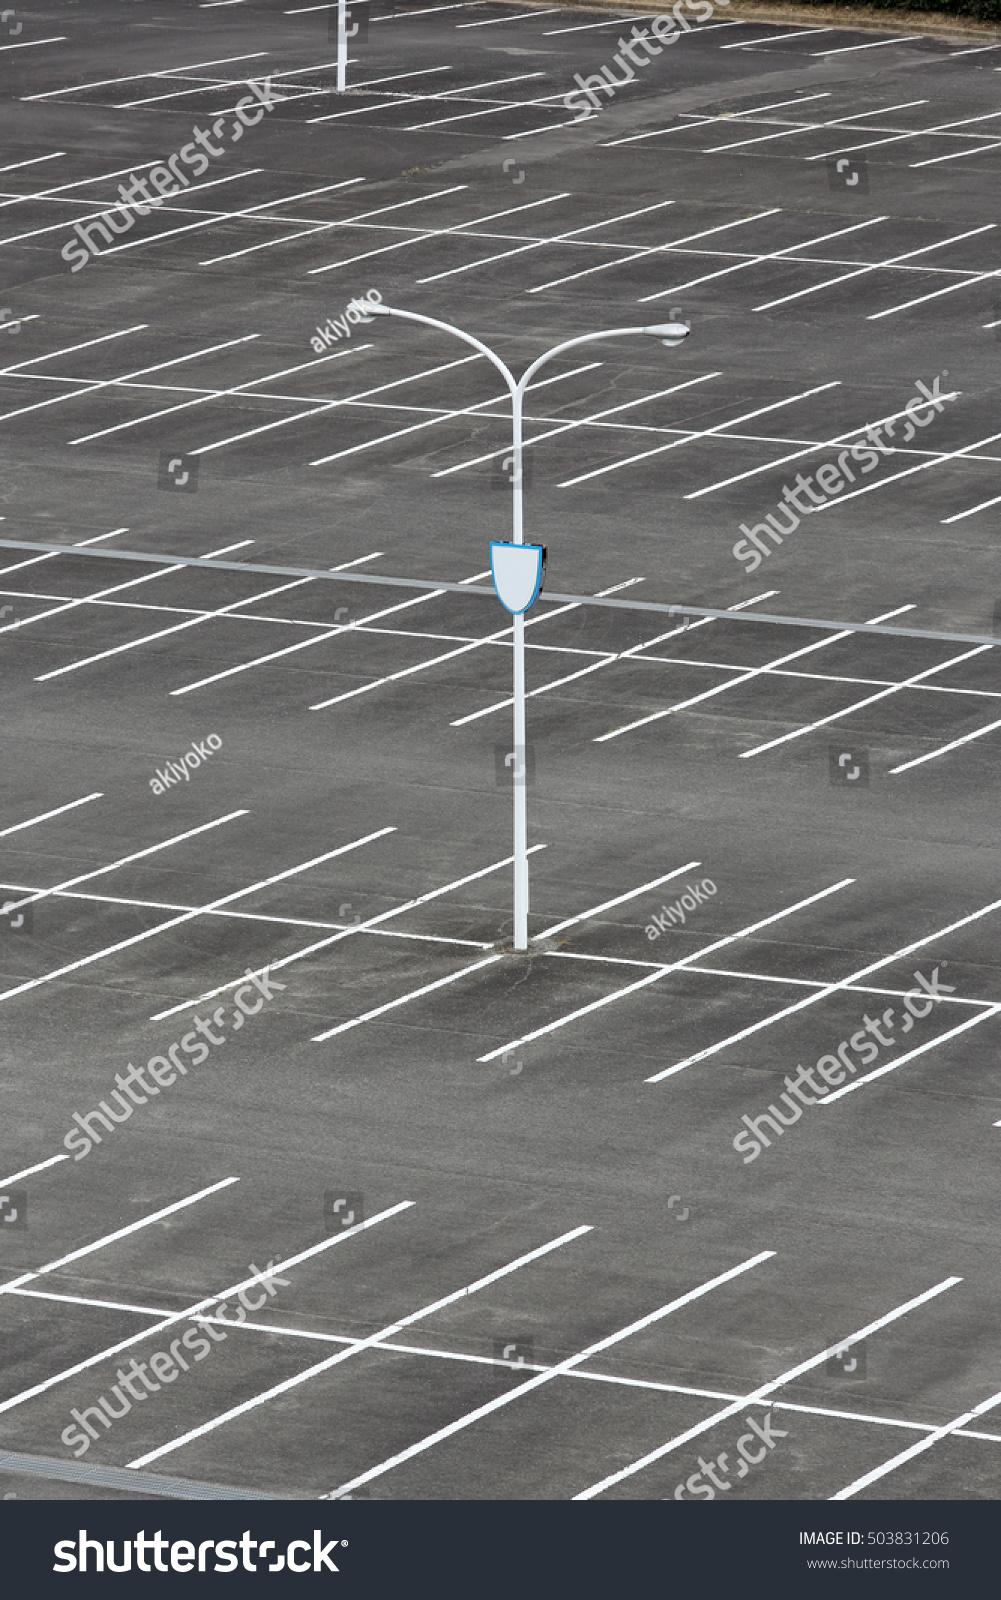 Car Parking White Mark Light Pole Stock Photo 503831206 Shutterstock